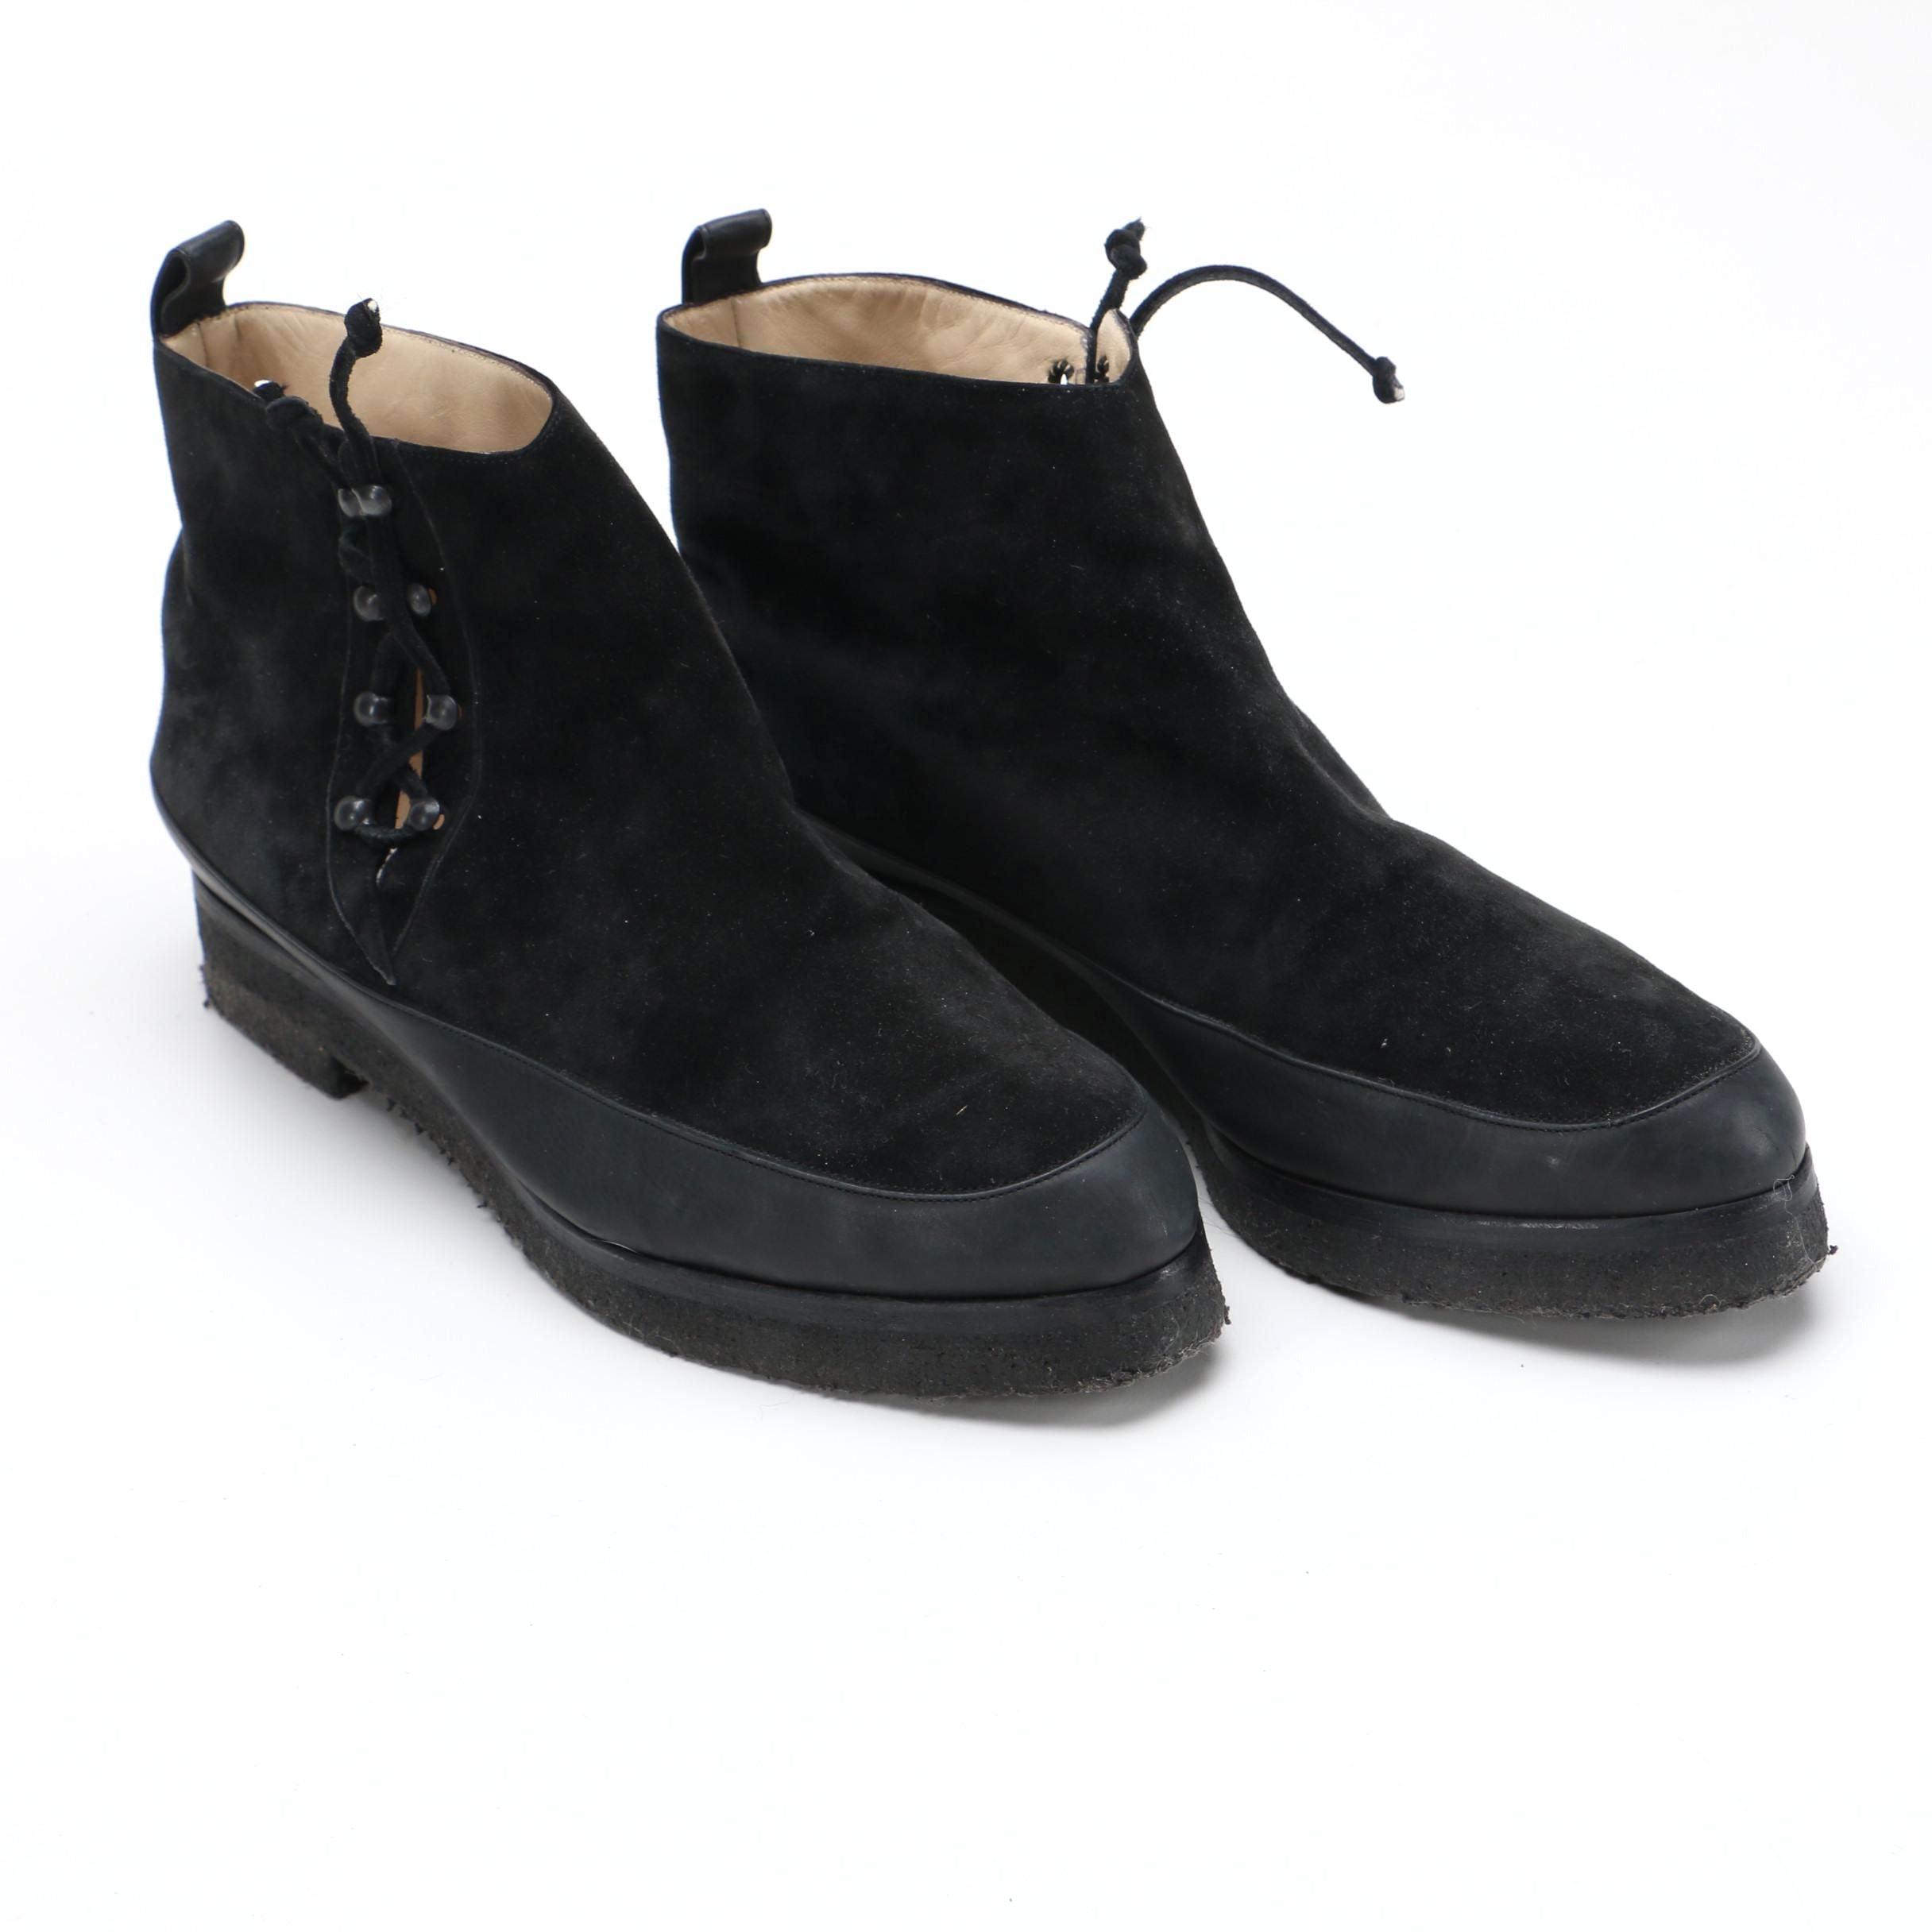 Manolo Blahnik Black Suede Women's Ankle Boots